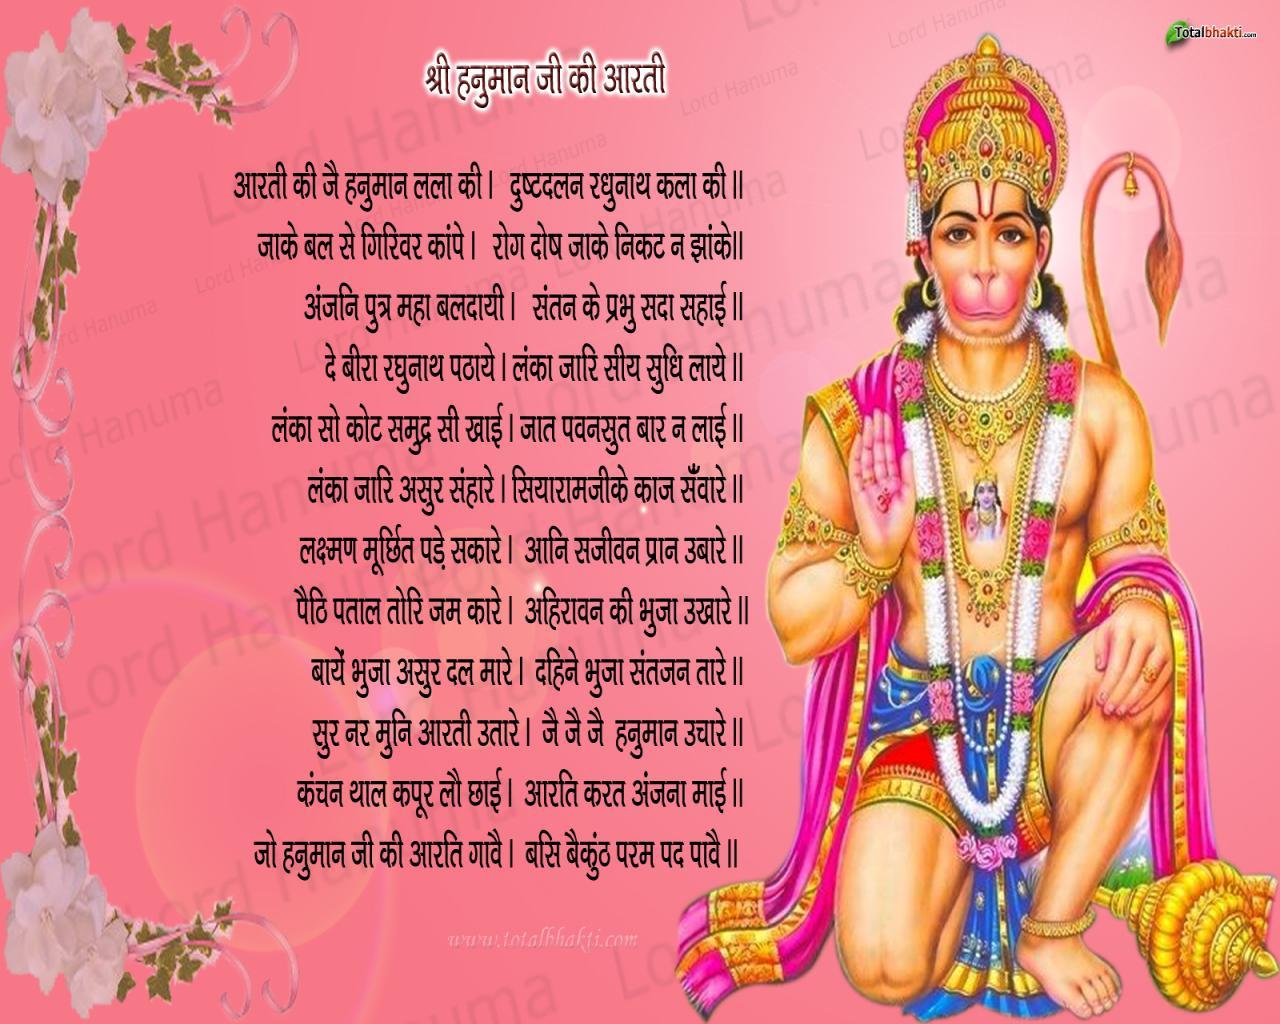 Hd wallpaper hanuman - Lord Hanuman Hd Wallpapers Free Wallpaper Downloads Lord Hanuman 1280x1024